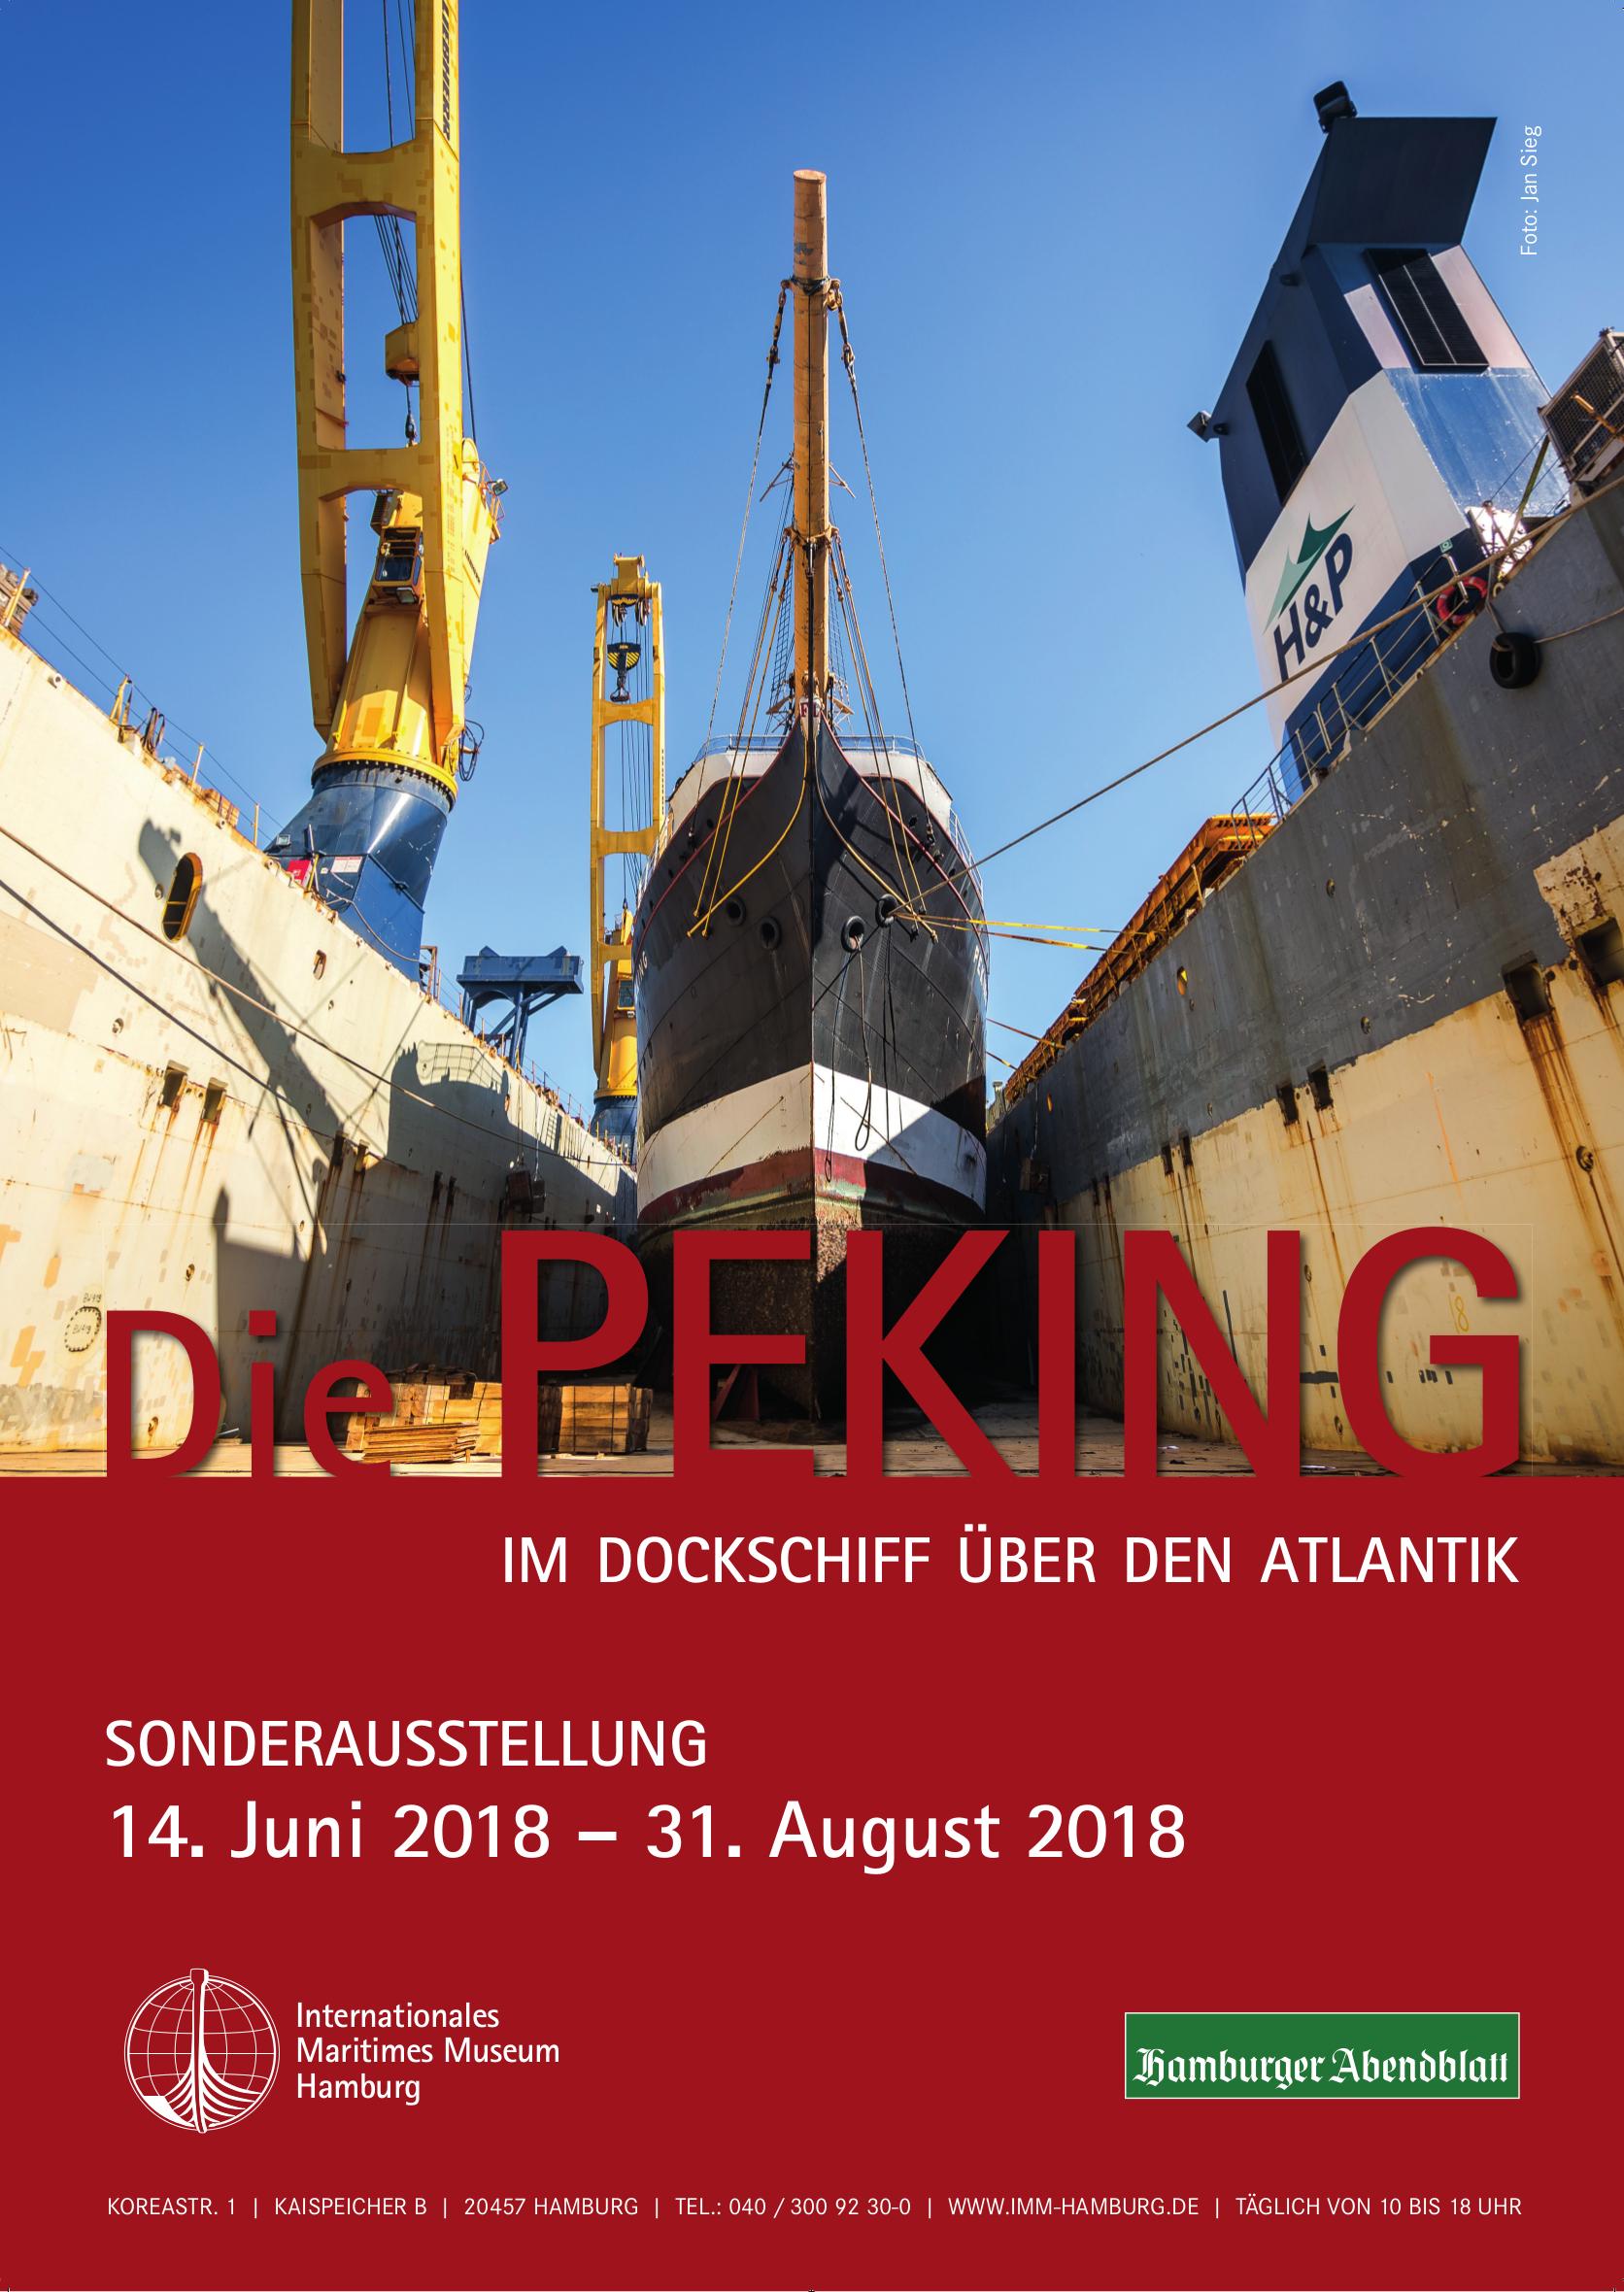 Peking Schiff Flying P-Liner Ausstellung Sonderausstellung Atlantik Fotografie Internationales Maritimes Museum Hamburg 2018 Plakat